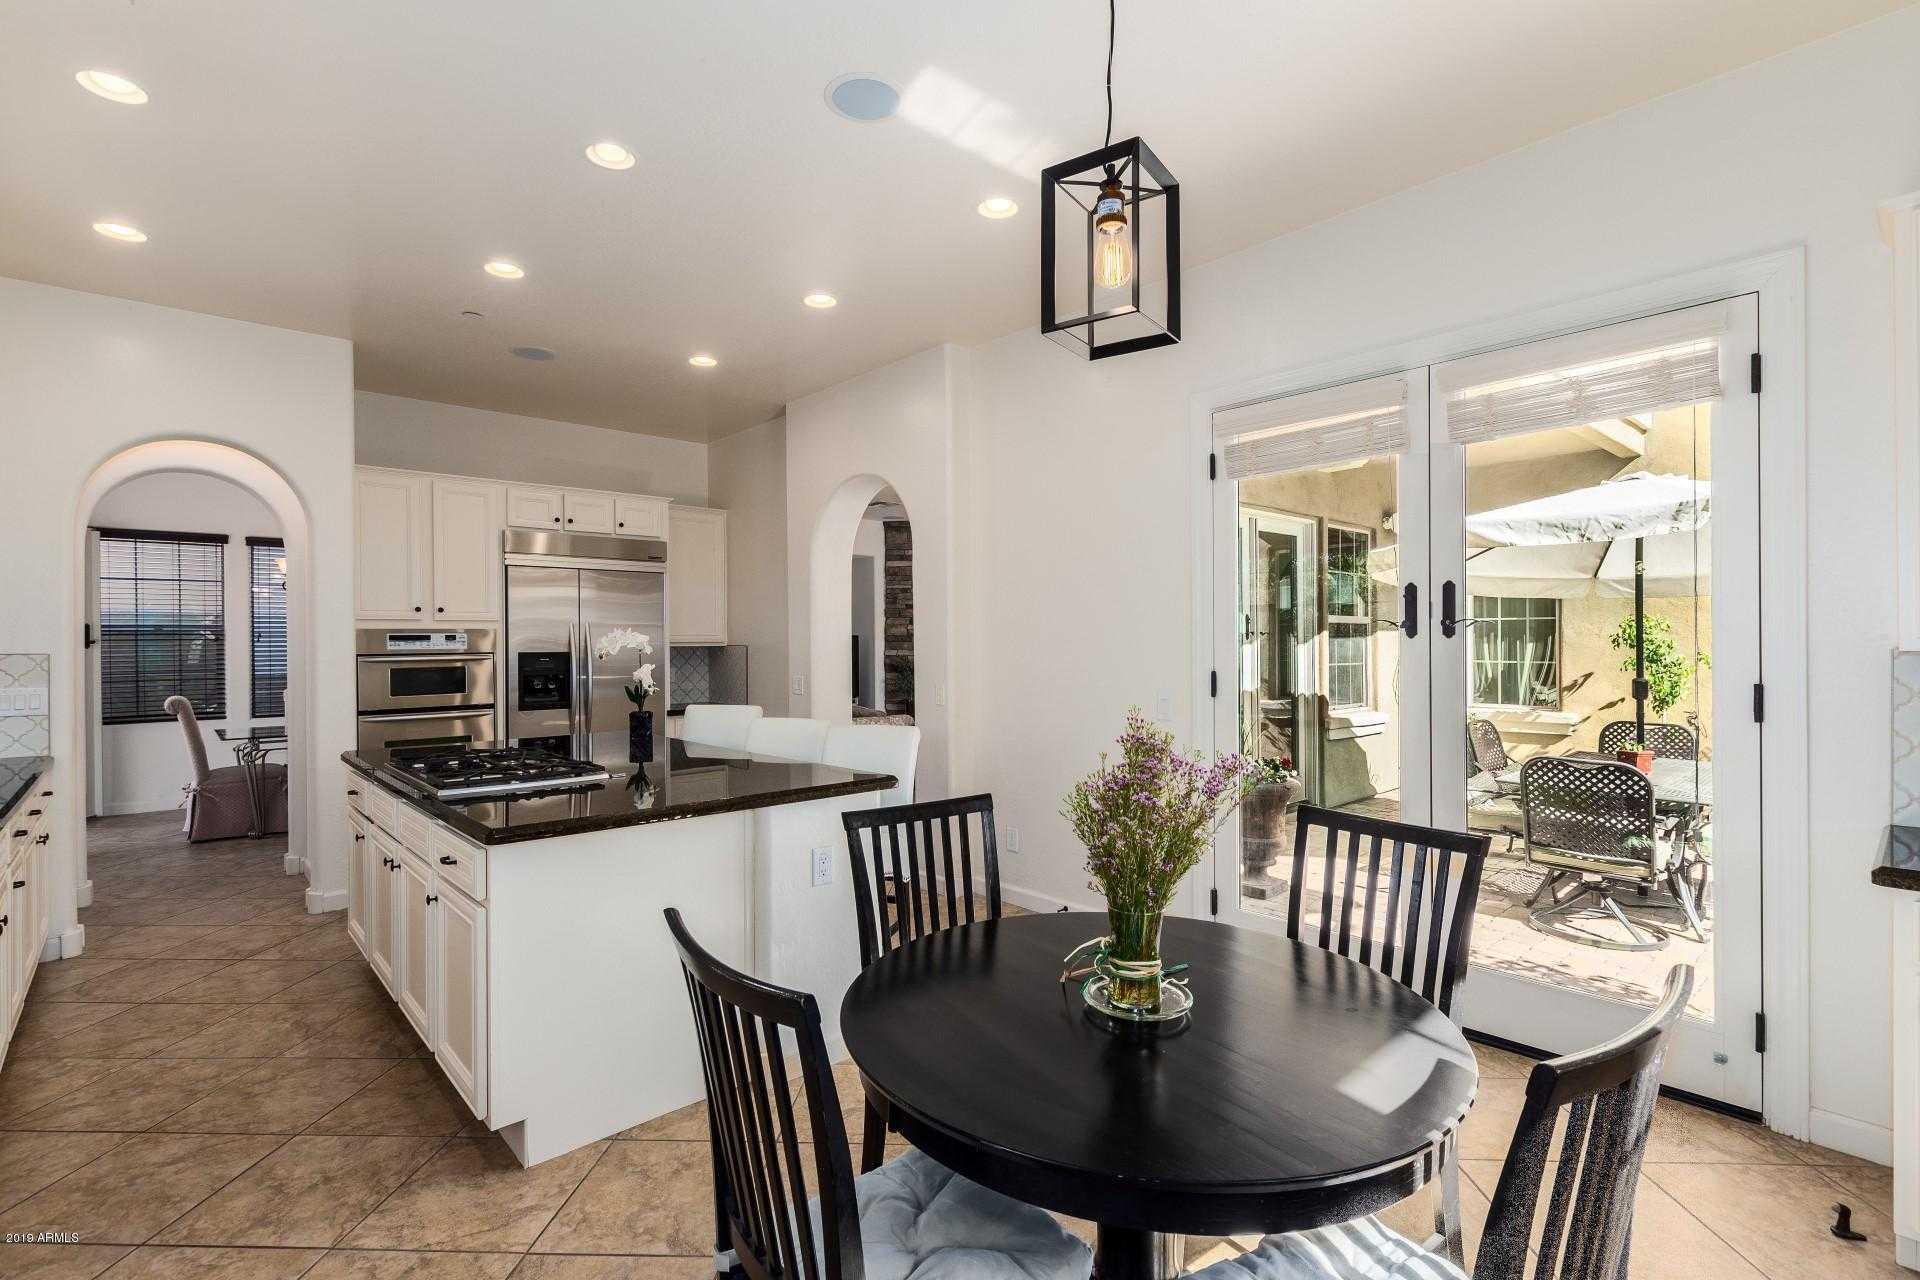 $749,900 - 5Br/5Ba - Home for Sale in Dc Ranch Parcel 1.13, Scottsdale